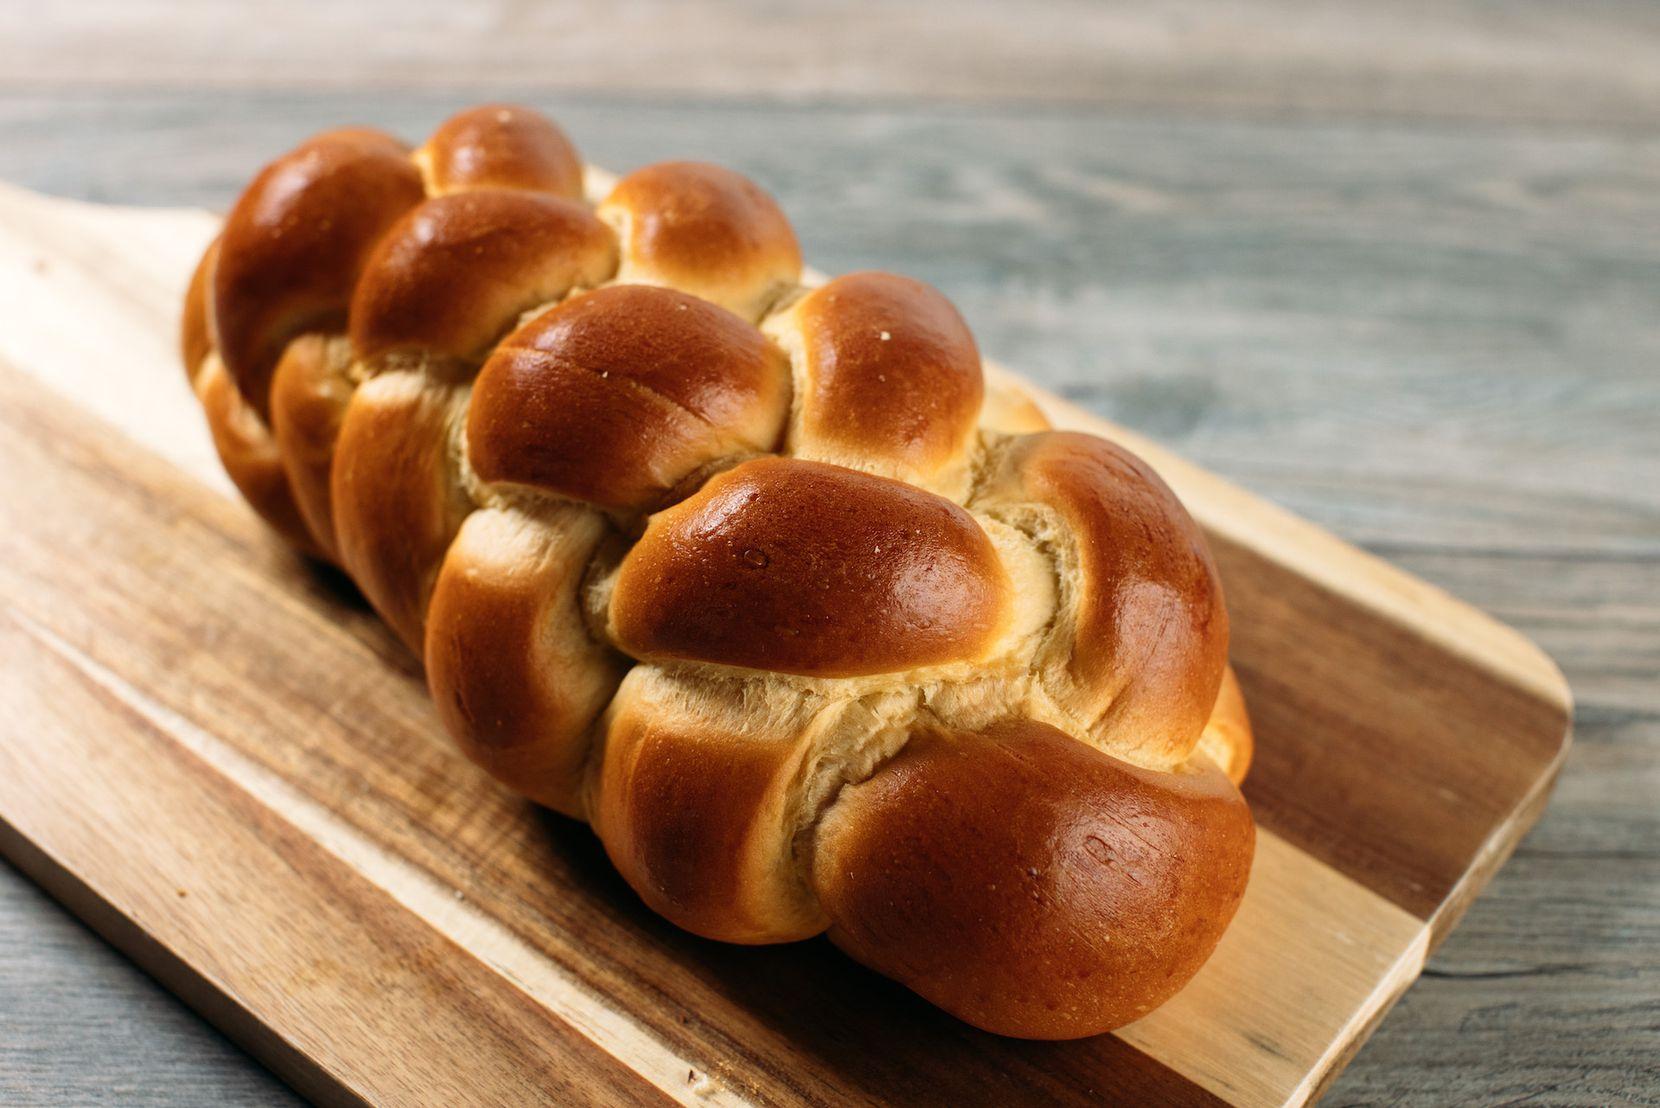 Eatzi's Hanukkah menu includes braided challah.